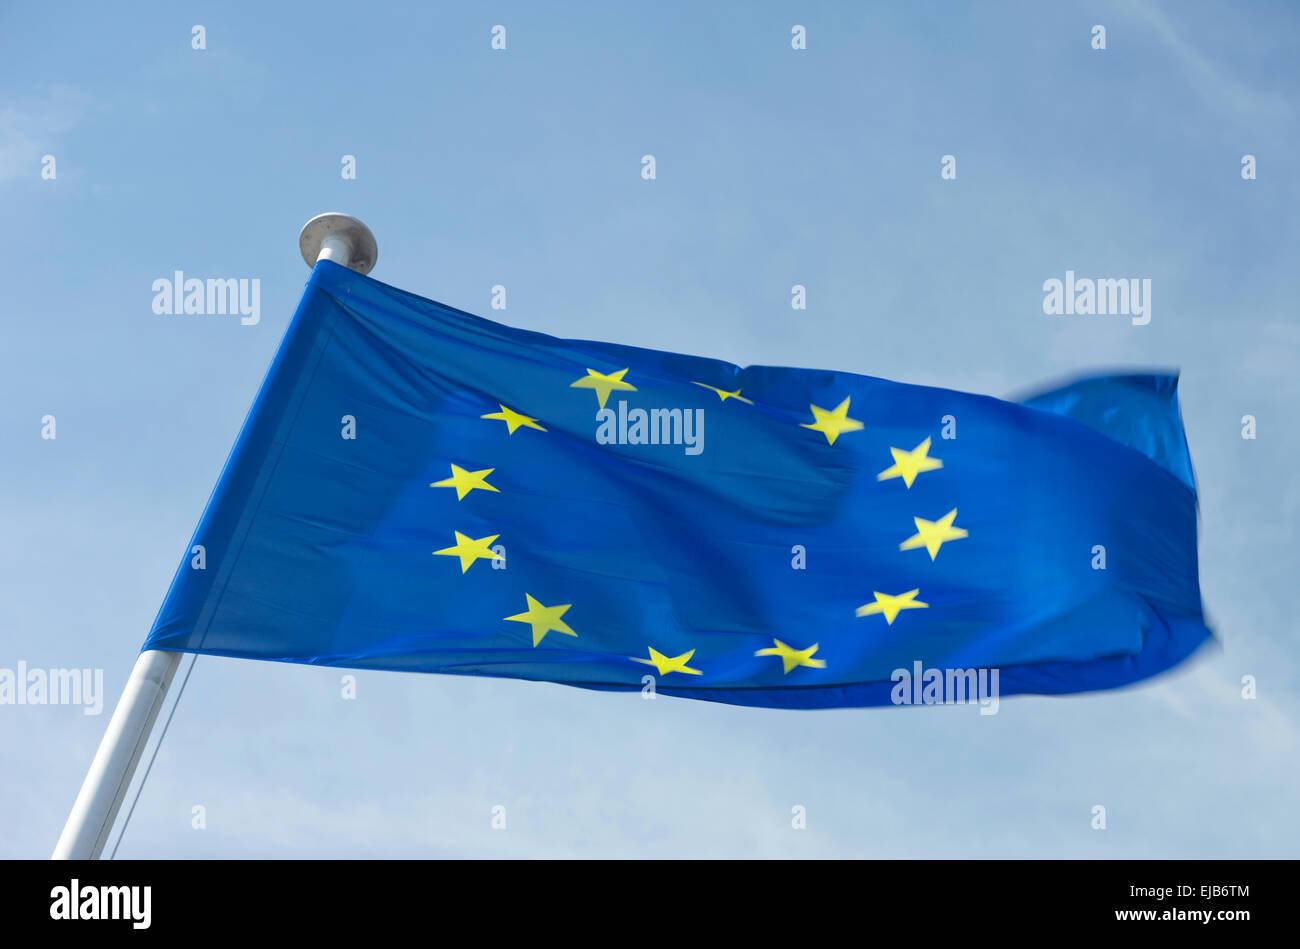 EUROPEAN UNION COUNCIL OF EUROPE  EU FLAG FLYING ON FLAGPOLE - Stock Image